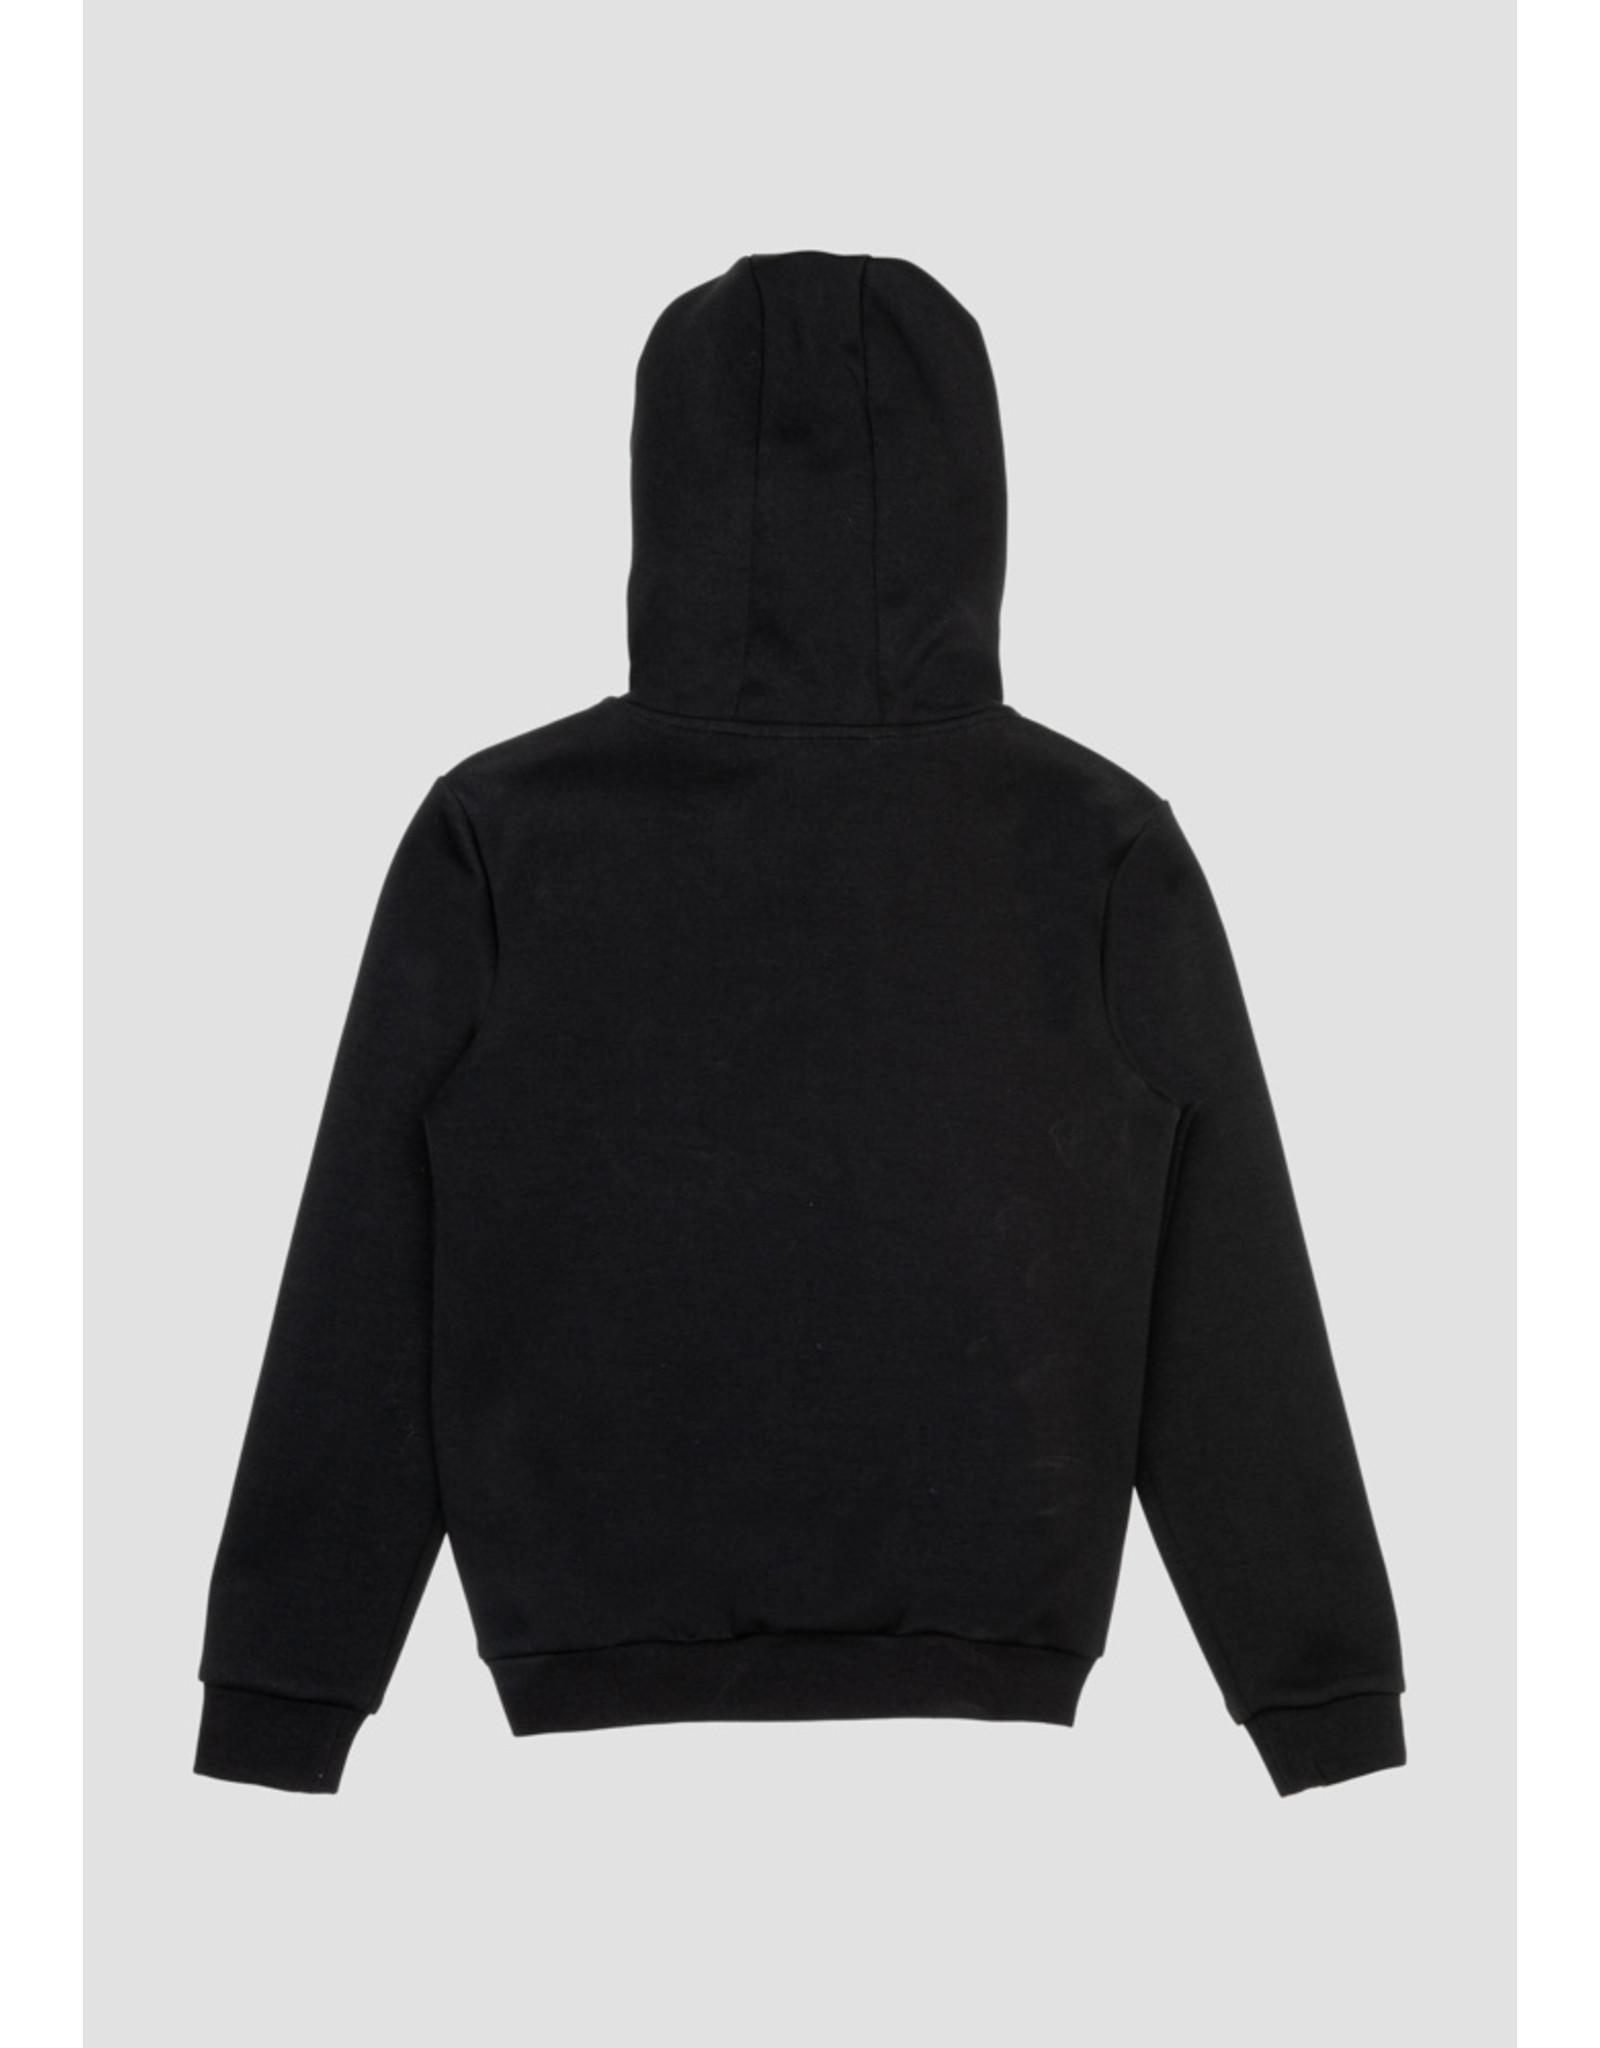 Antony Morato sweater digital zwart